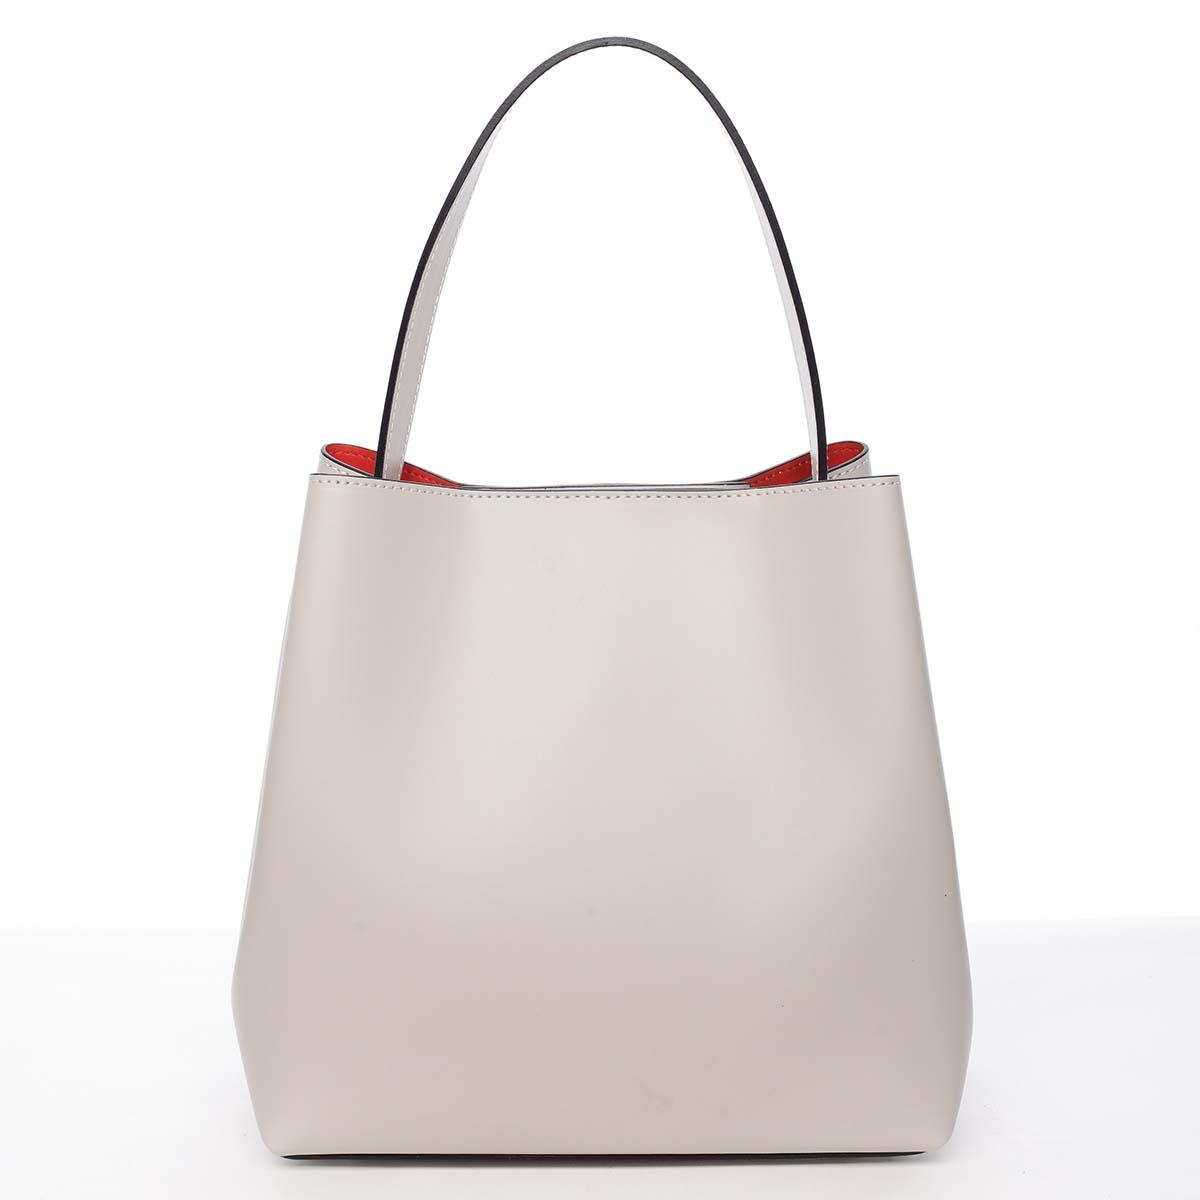 Dámska luxusná kožená kabelka béžová - ItalY Hania béžová